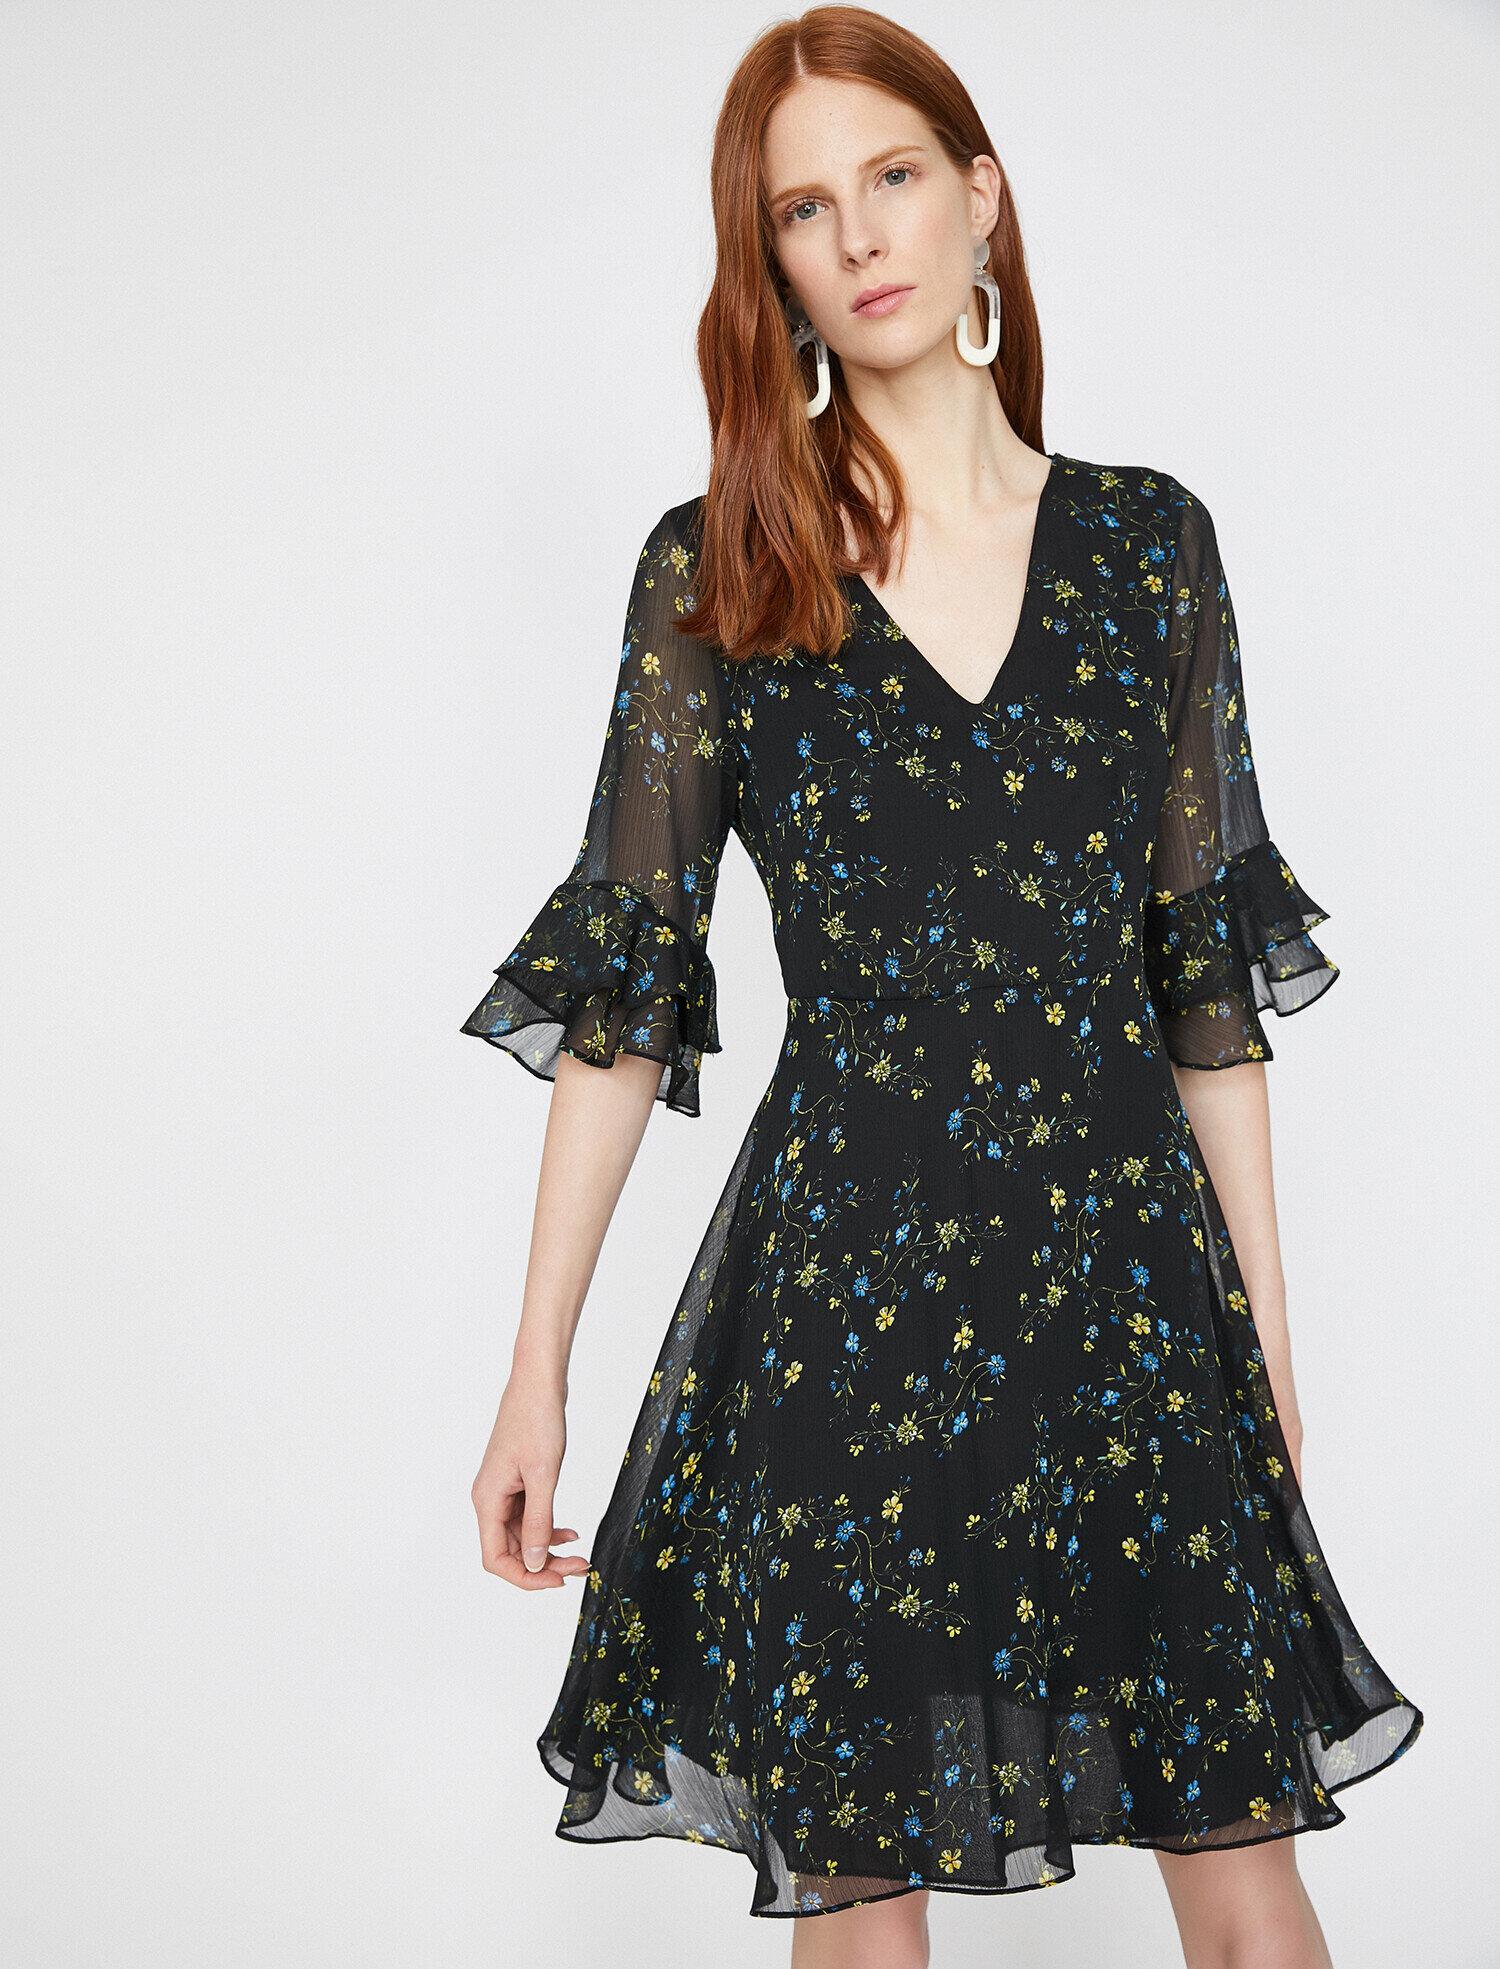 4323a0a059c32 Siyah Bayan The Floral Dress - Çiçek Desenli Elbise 9YAK88322PW03A ...